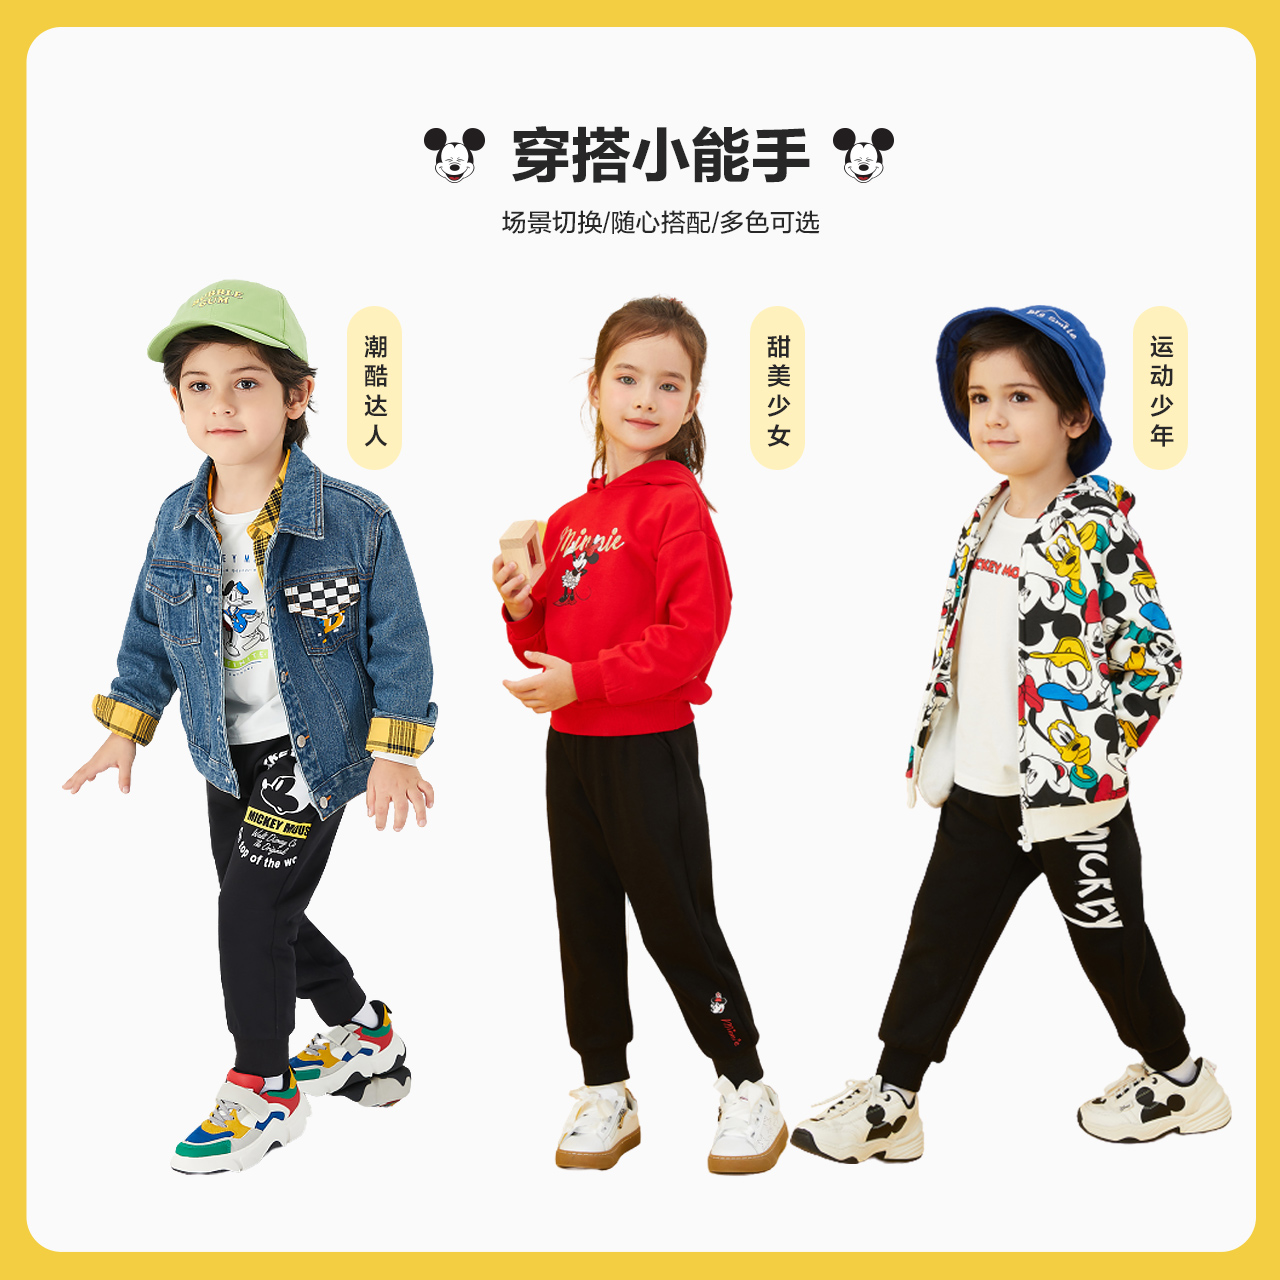 Disney baby 迪士尼 儿童针织运动长裤 天猫优惠券折后¥59包邮(¥99-40) 男、女童90~140cm常规款/加绒款多色可选